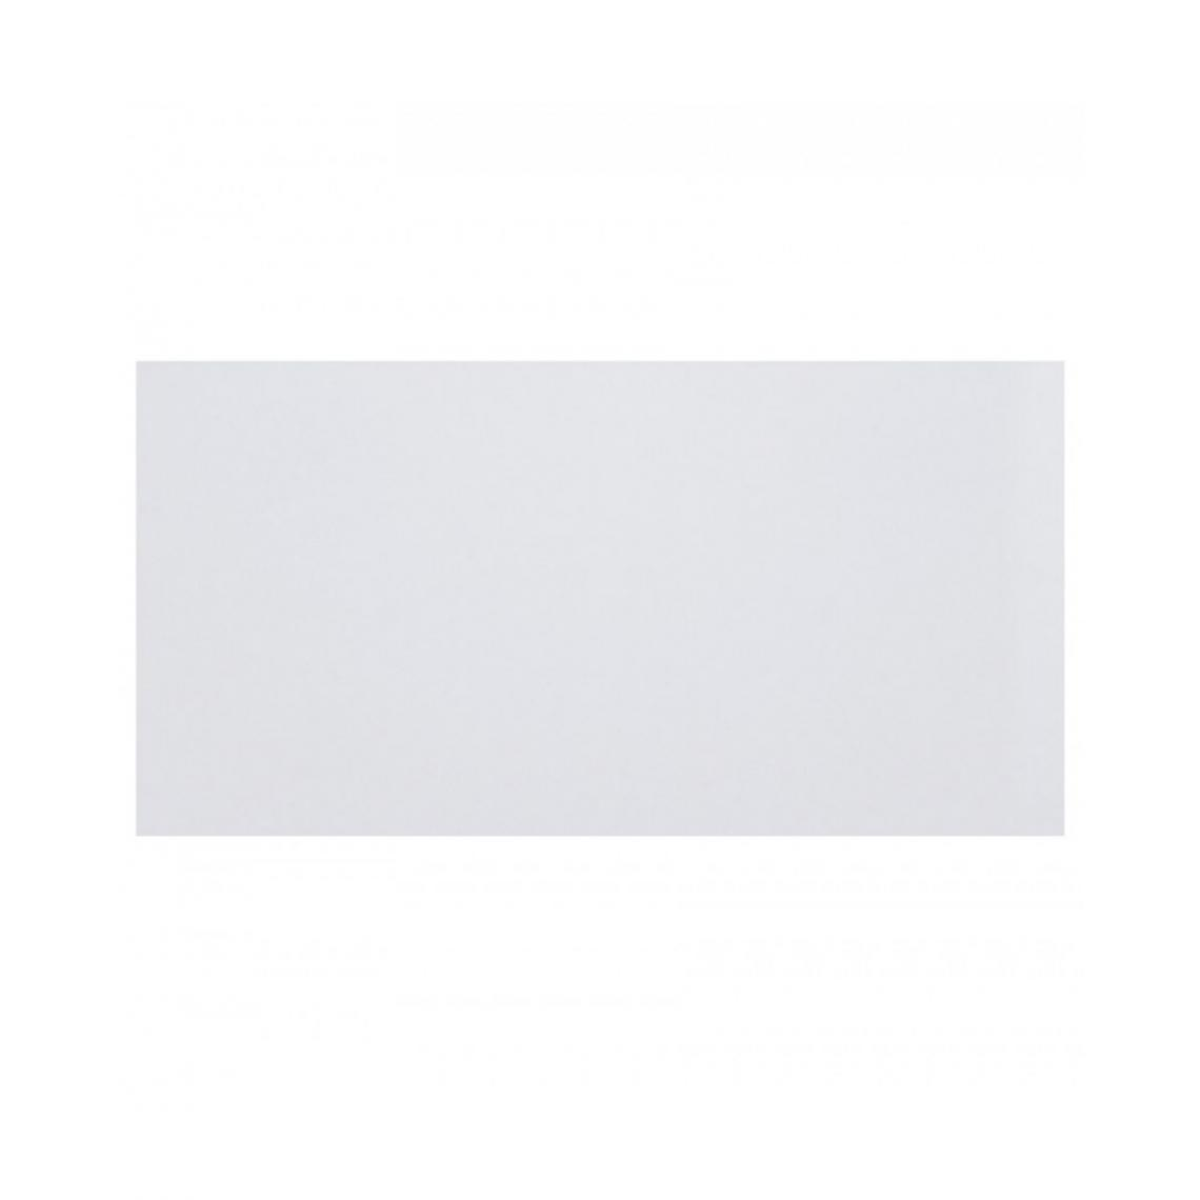 Kokoon Design Plateau de table WHITE 70x140x3 cm